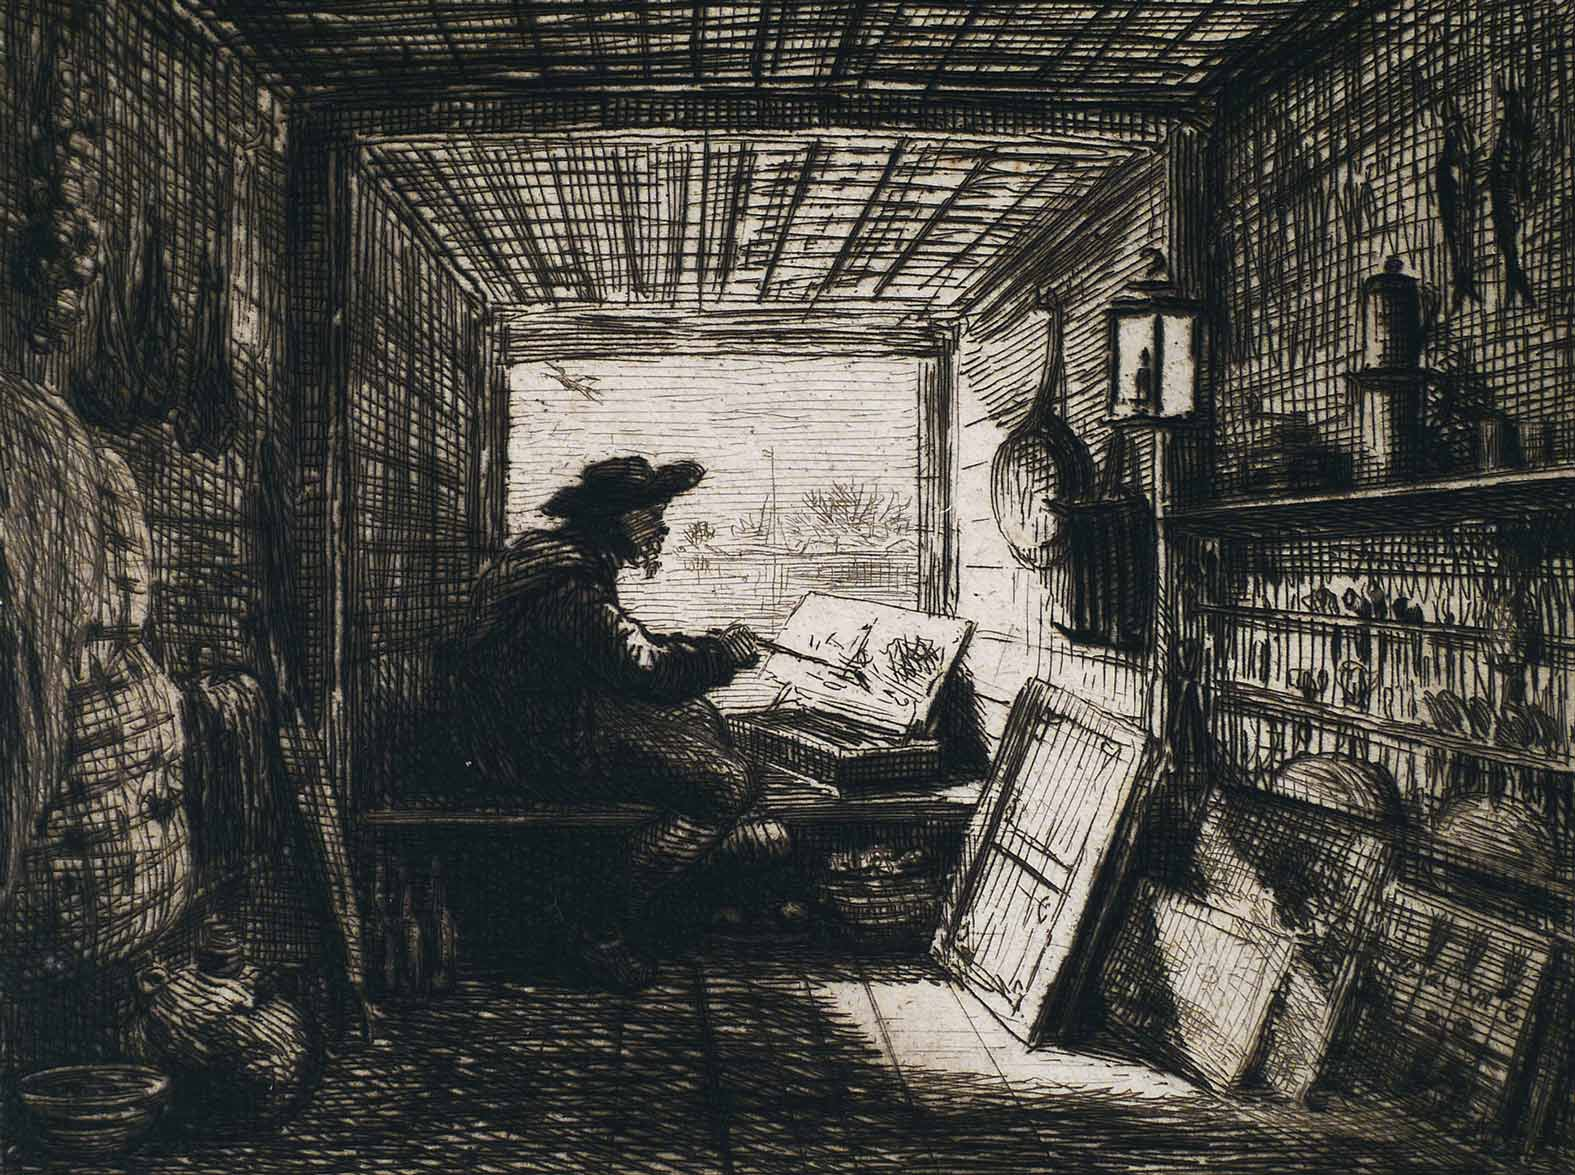 2-Daubigny,-The-Studio-on-the-Boat,-1861